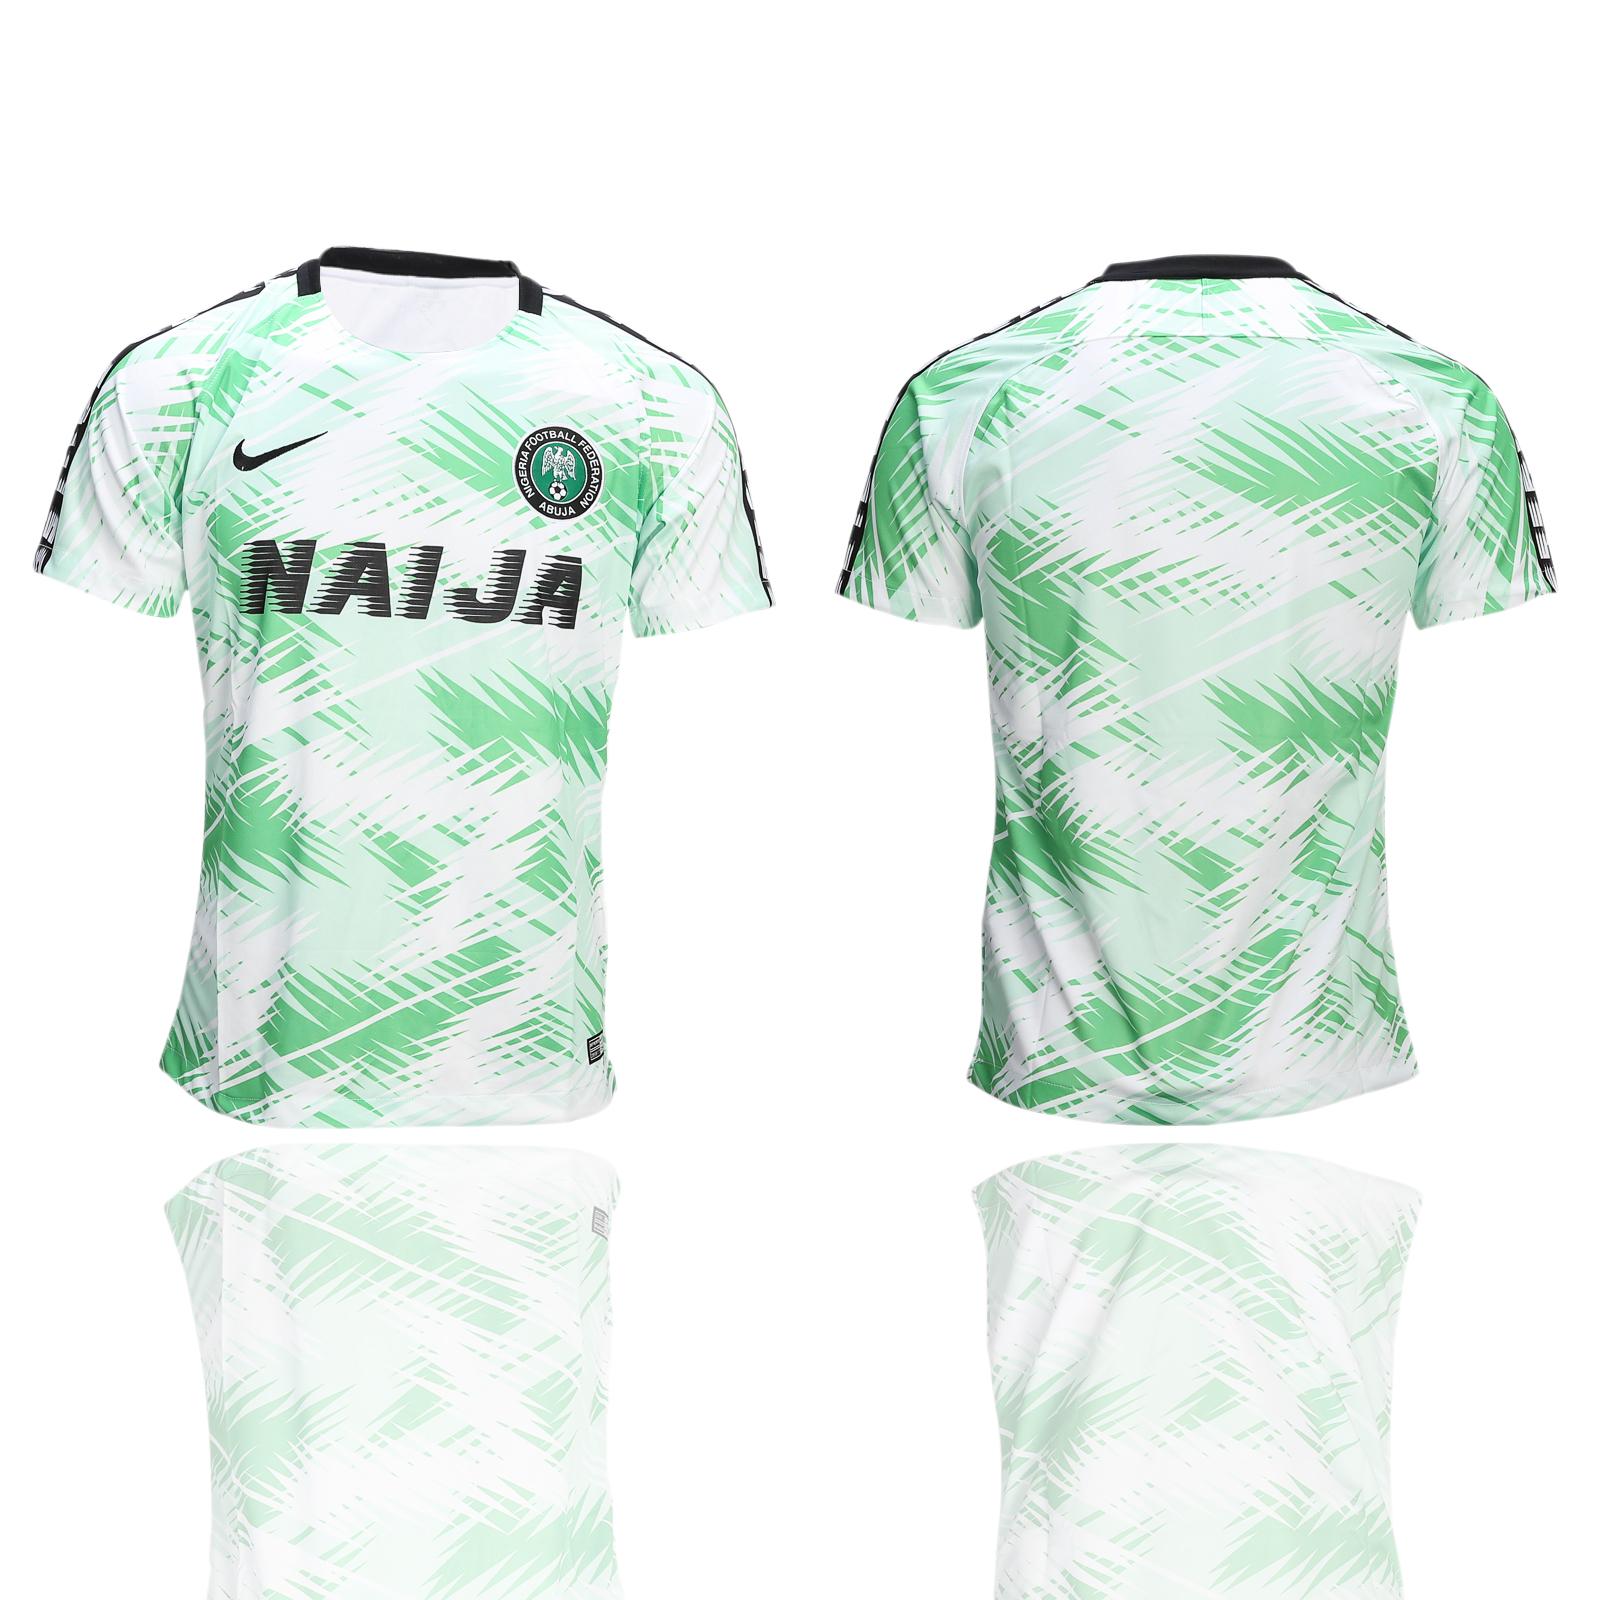 online store 3b487 b7b52 Nigeria, Wholesale Nigeria, China Nigeria,Discount Nigeria ...